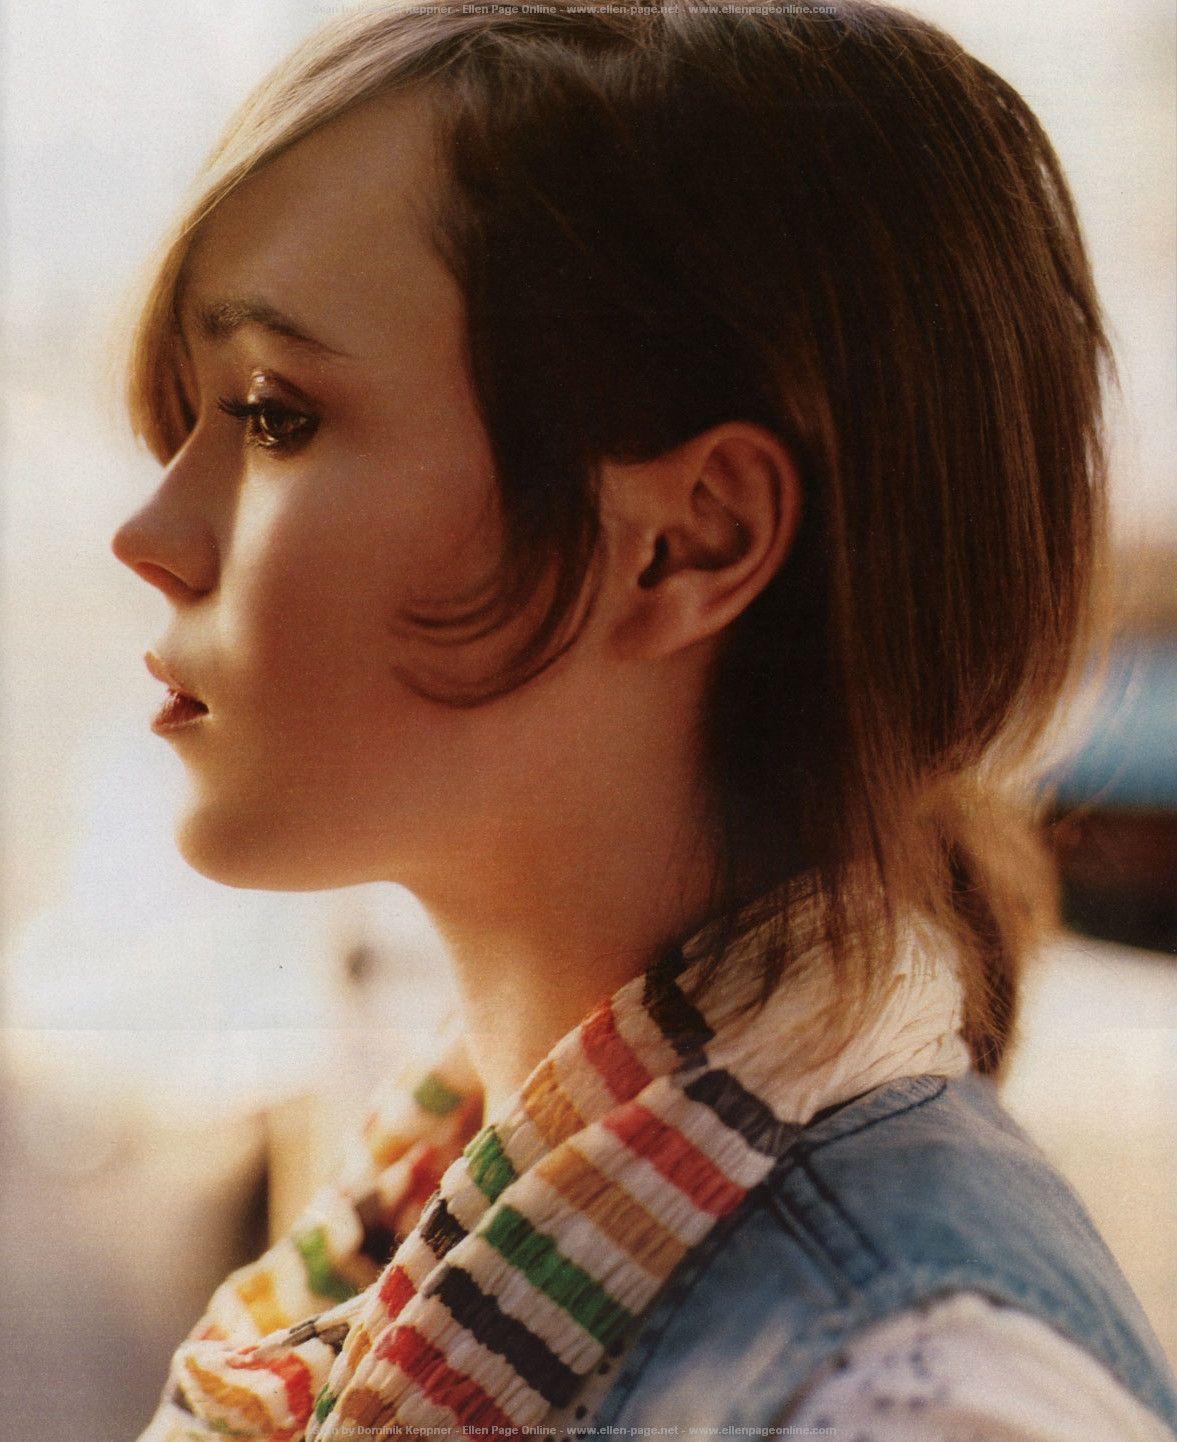 Ellen Page. Pucha.